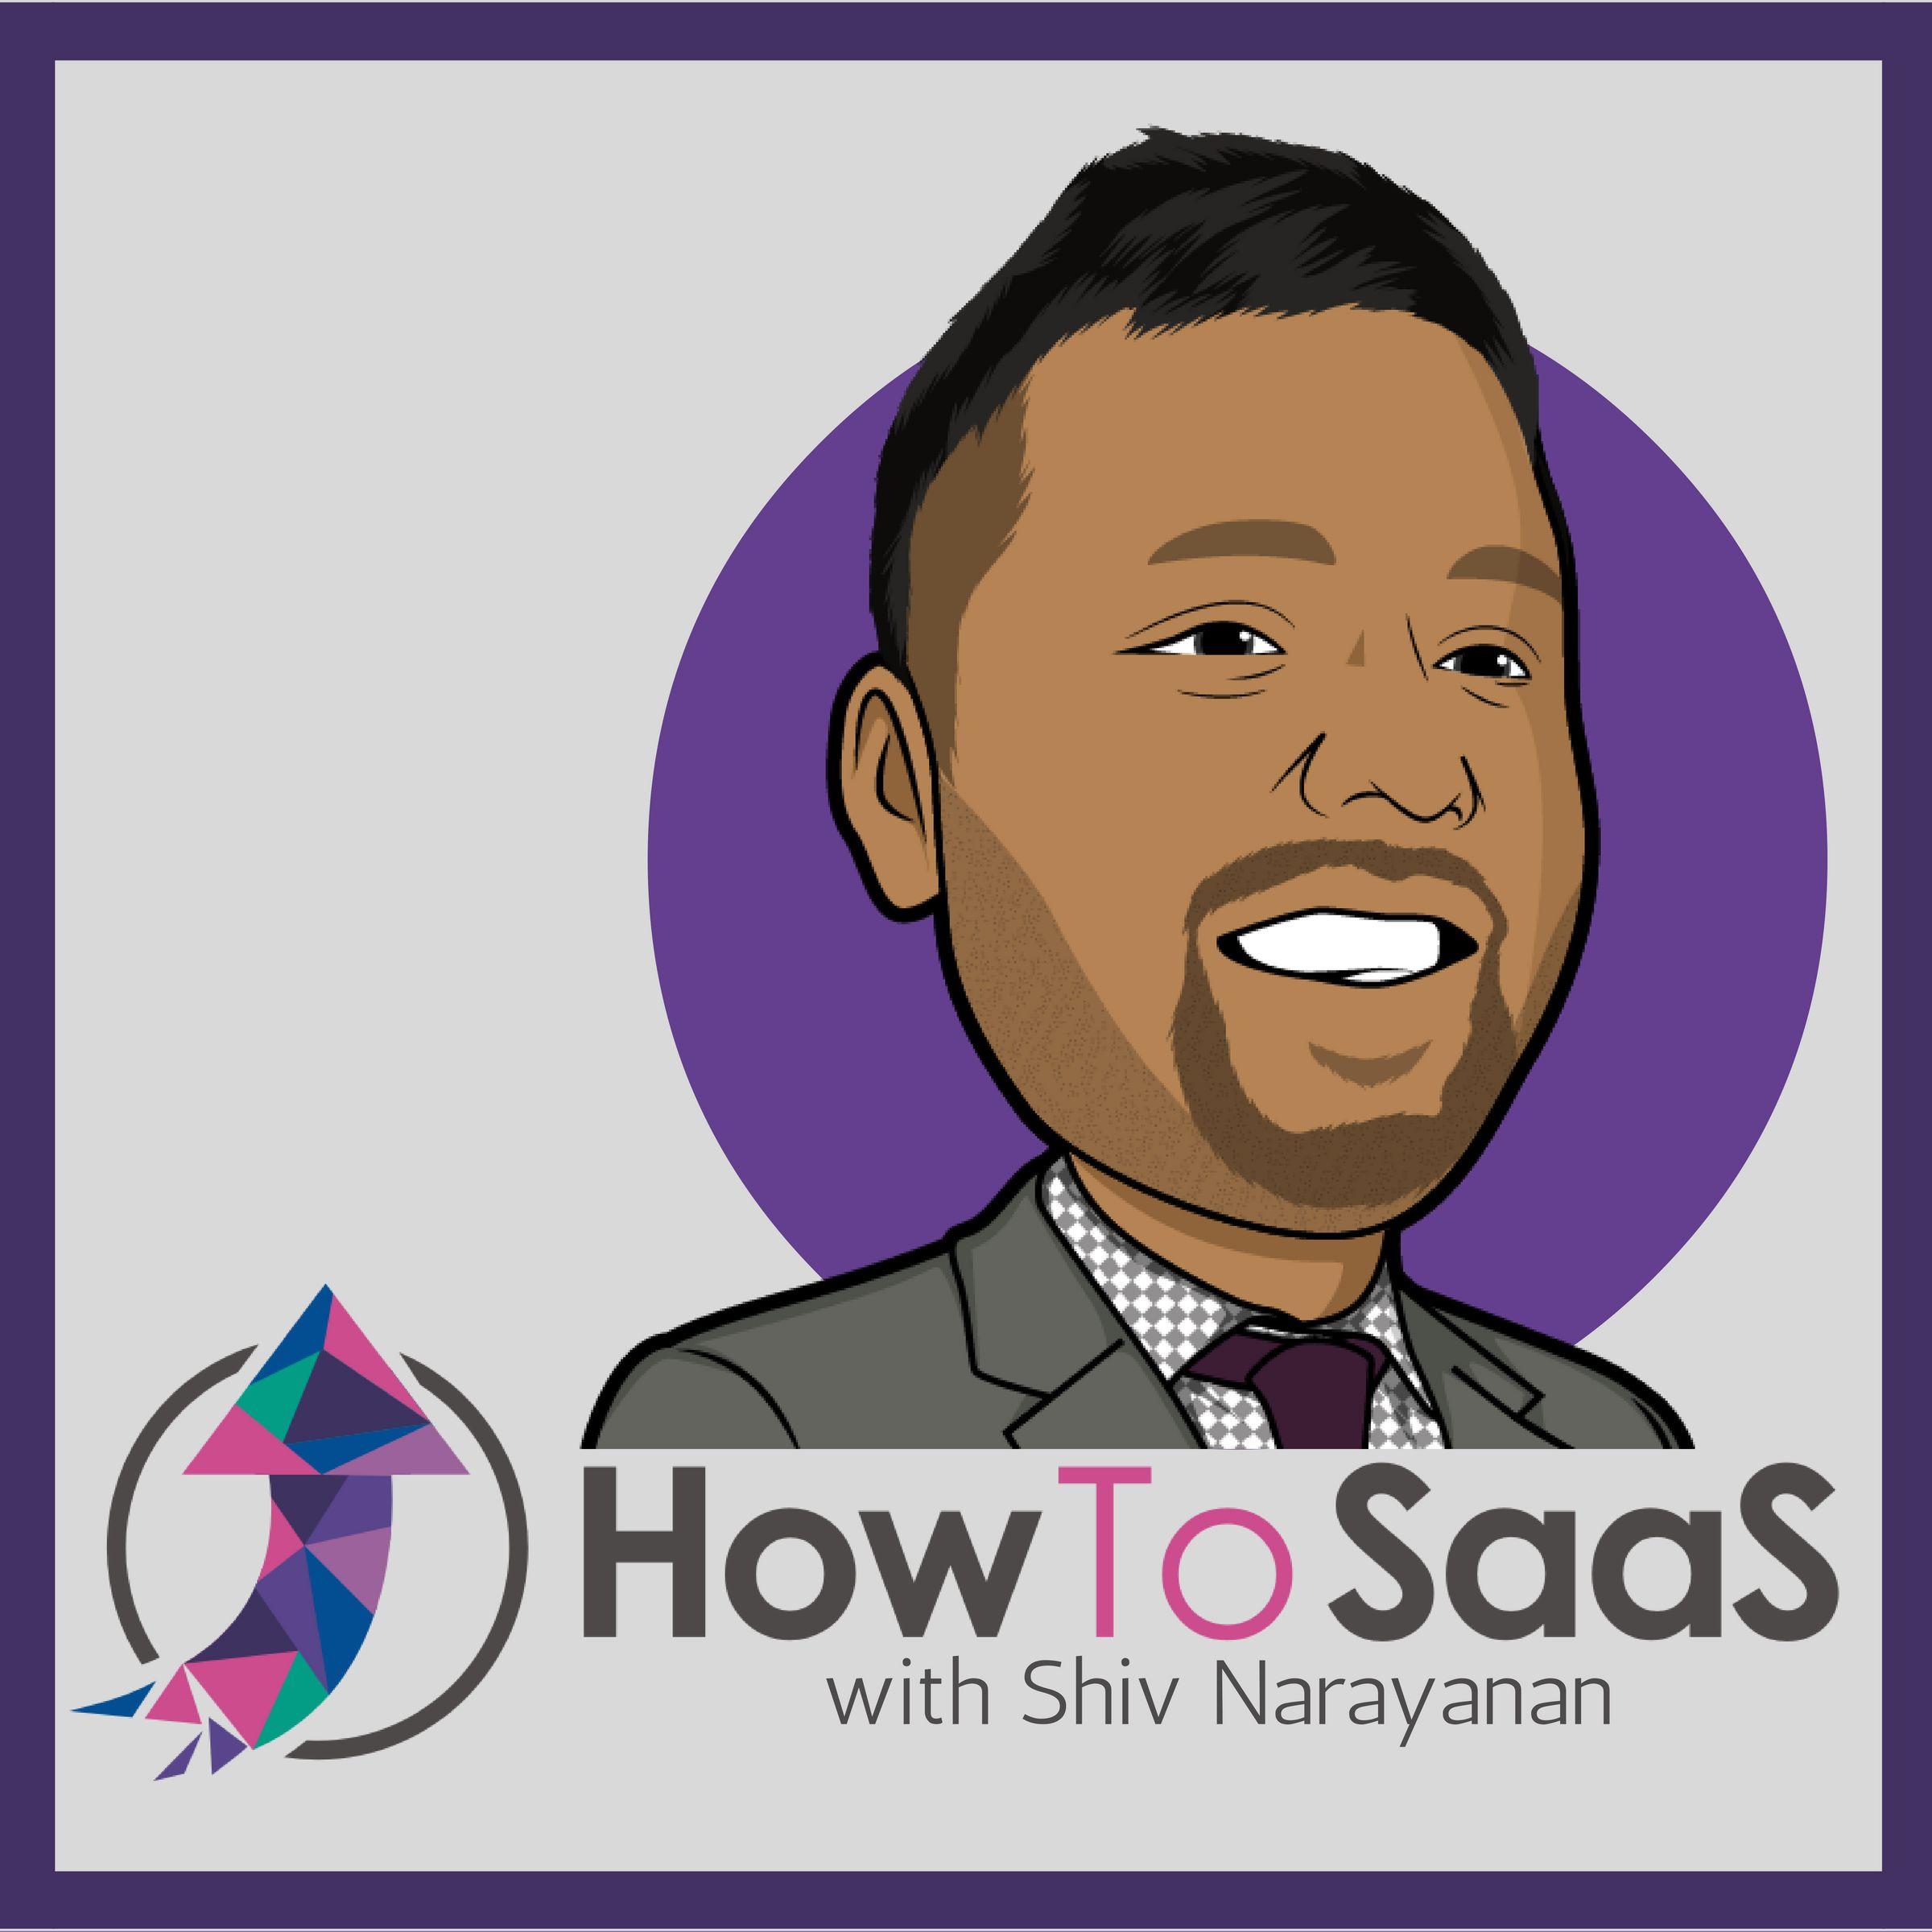 How To SaaS